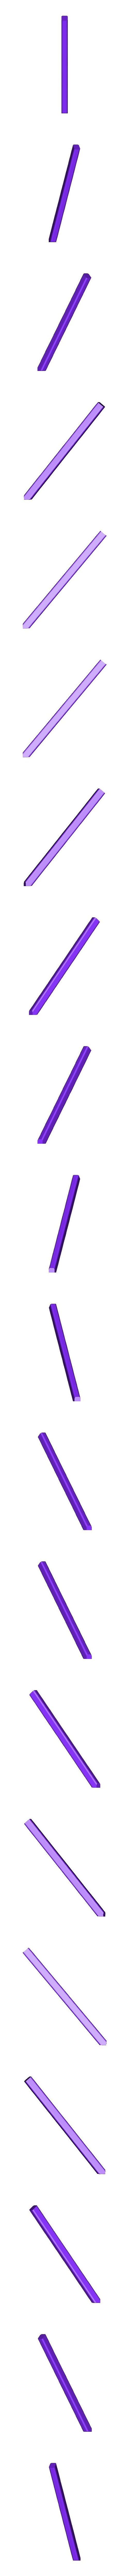 15-MAIN LDG  STRUT.stl Download STL file DOUGLAS F4D SKYRAY  • 3D printer object, 3DprintedArmy